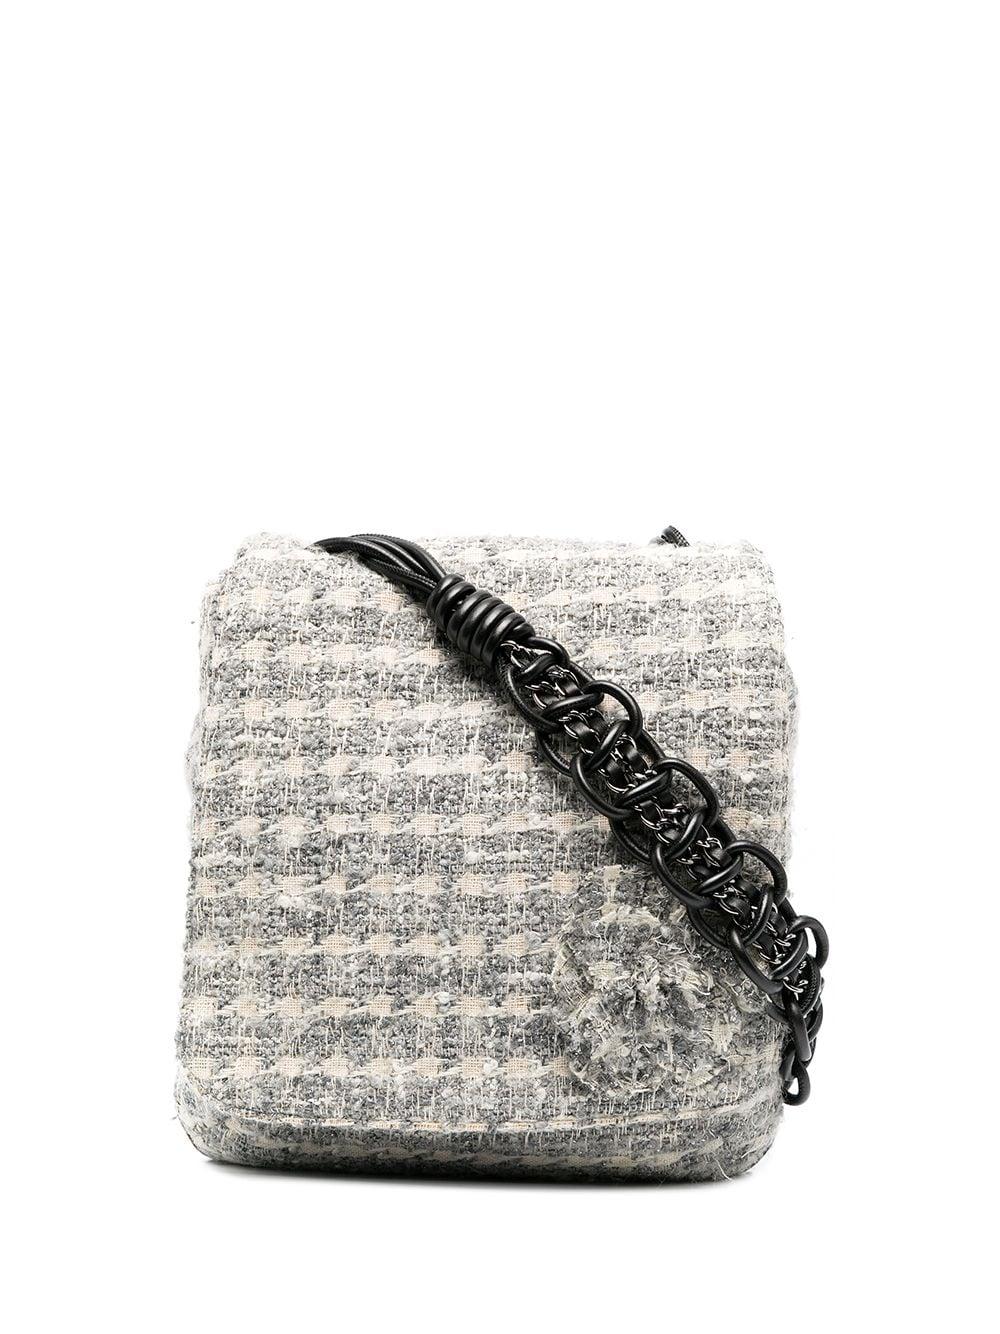 Chanel Pre-Owned 2019 Tweed-Umhängetasche - Nude